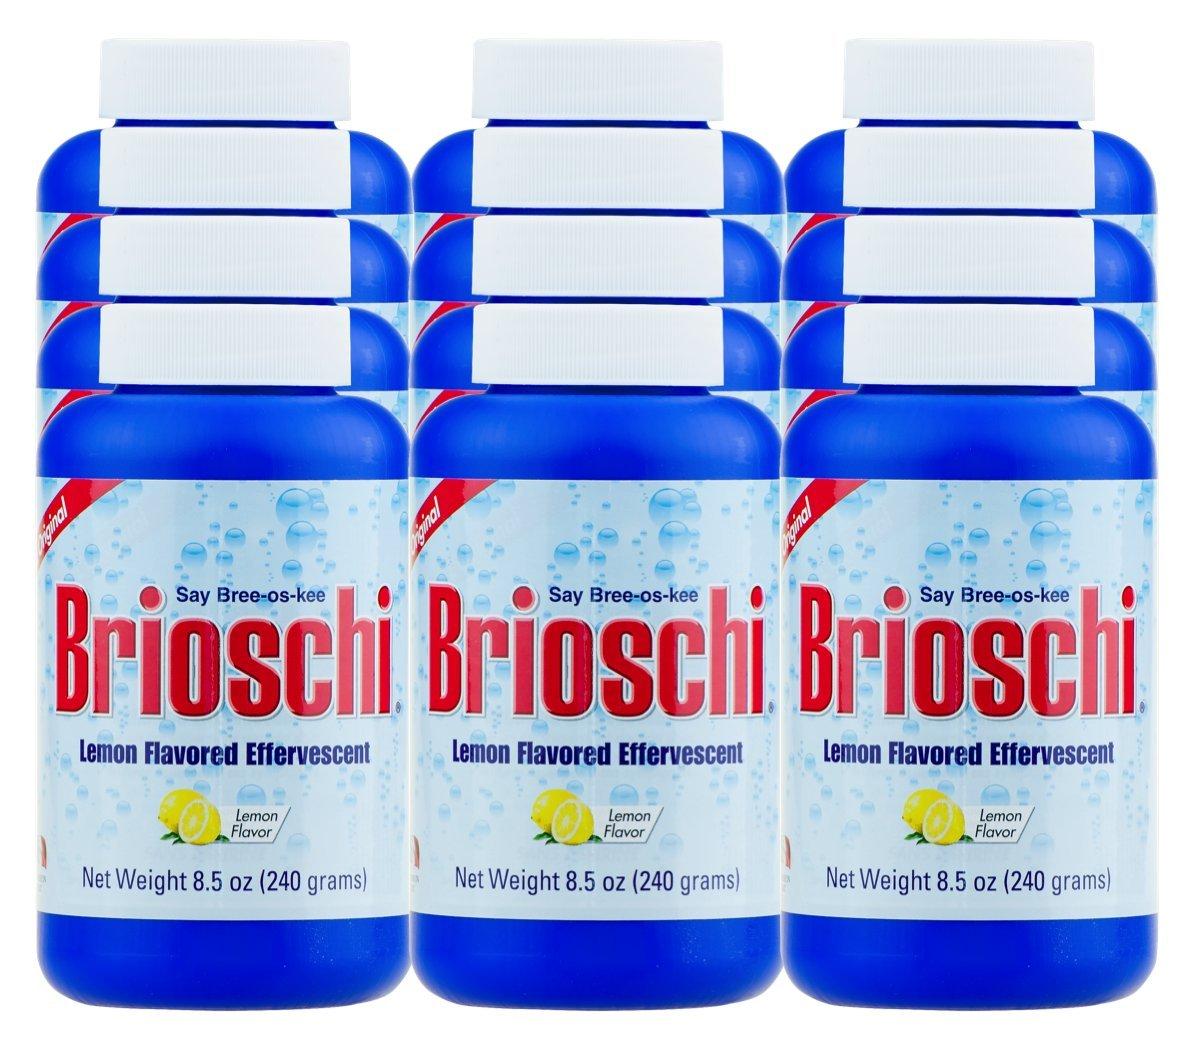 Brioschi Effervescent 8.5oz (12 Bottles) The Original Lemon Flavored Italian Effervescent 12 bottles